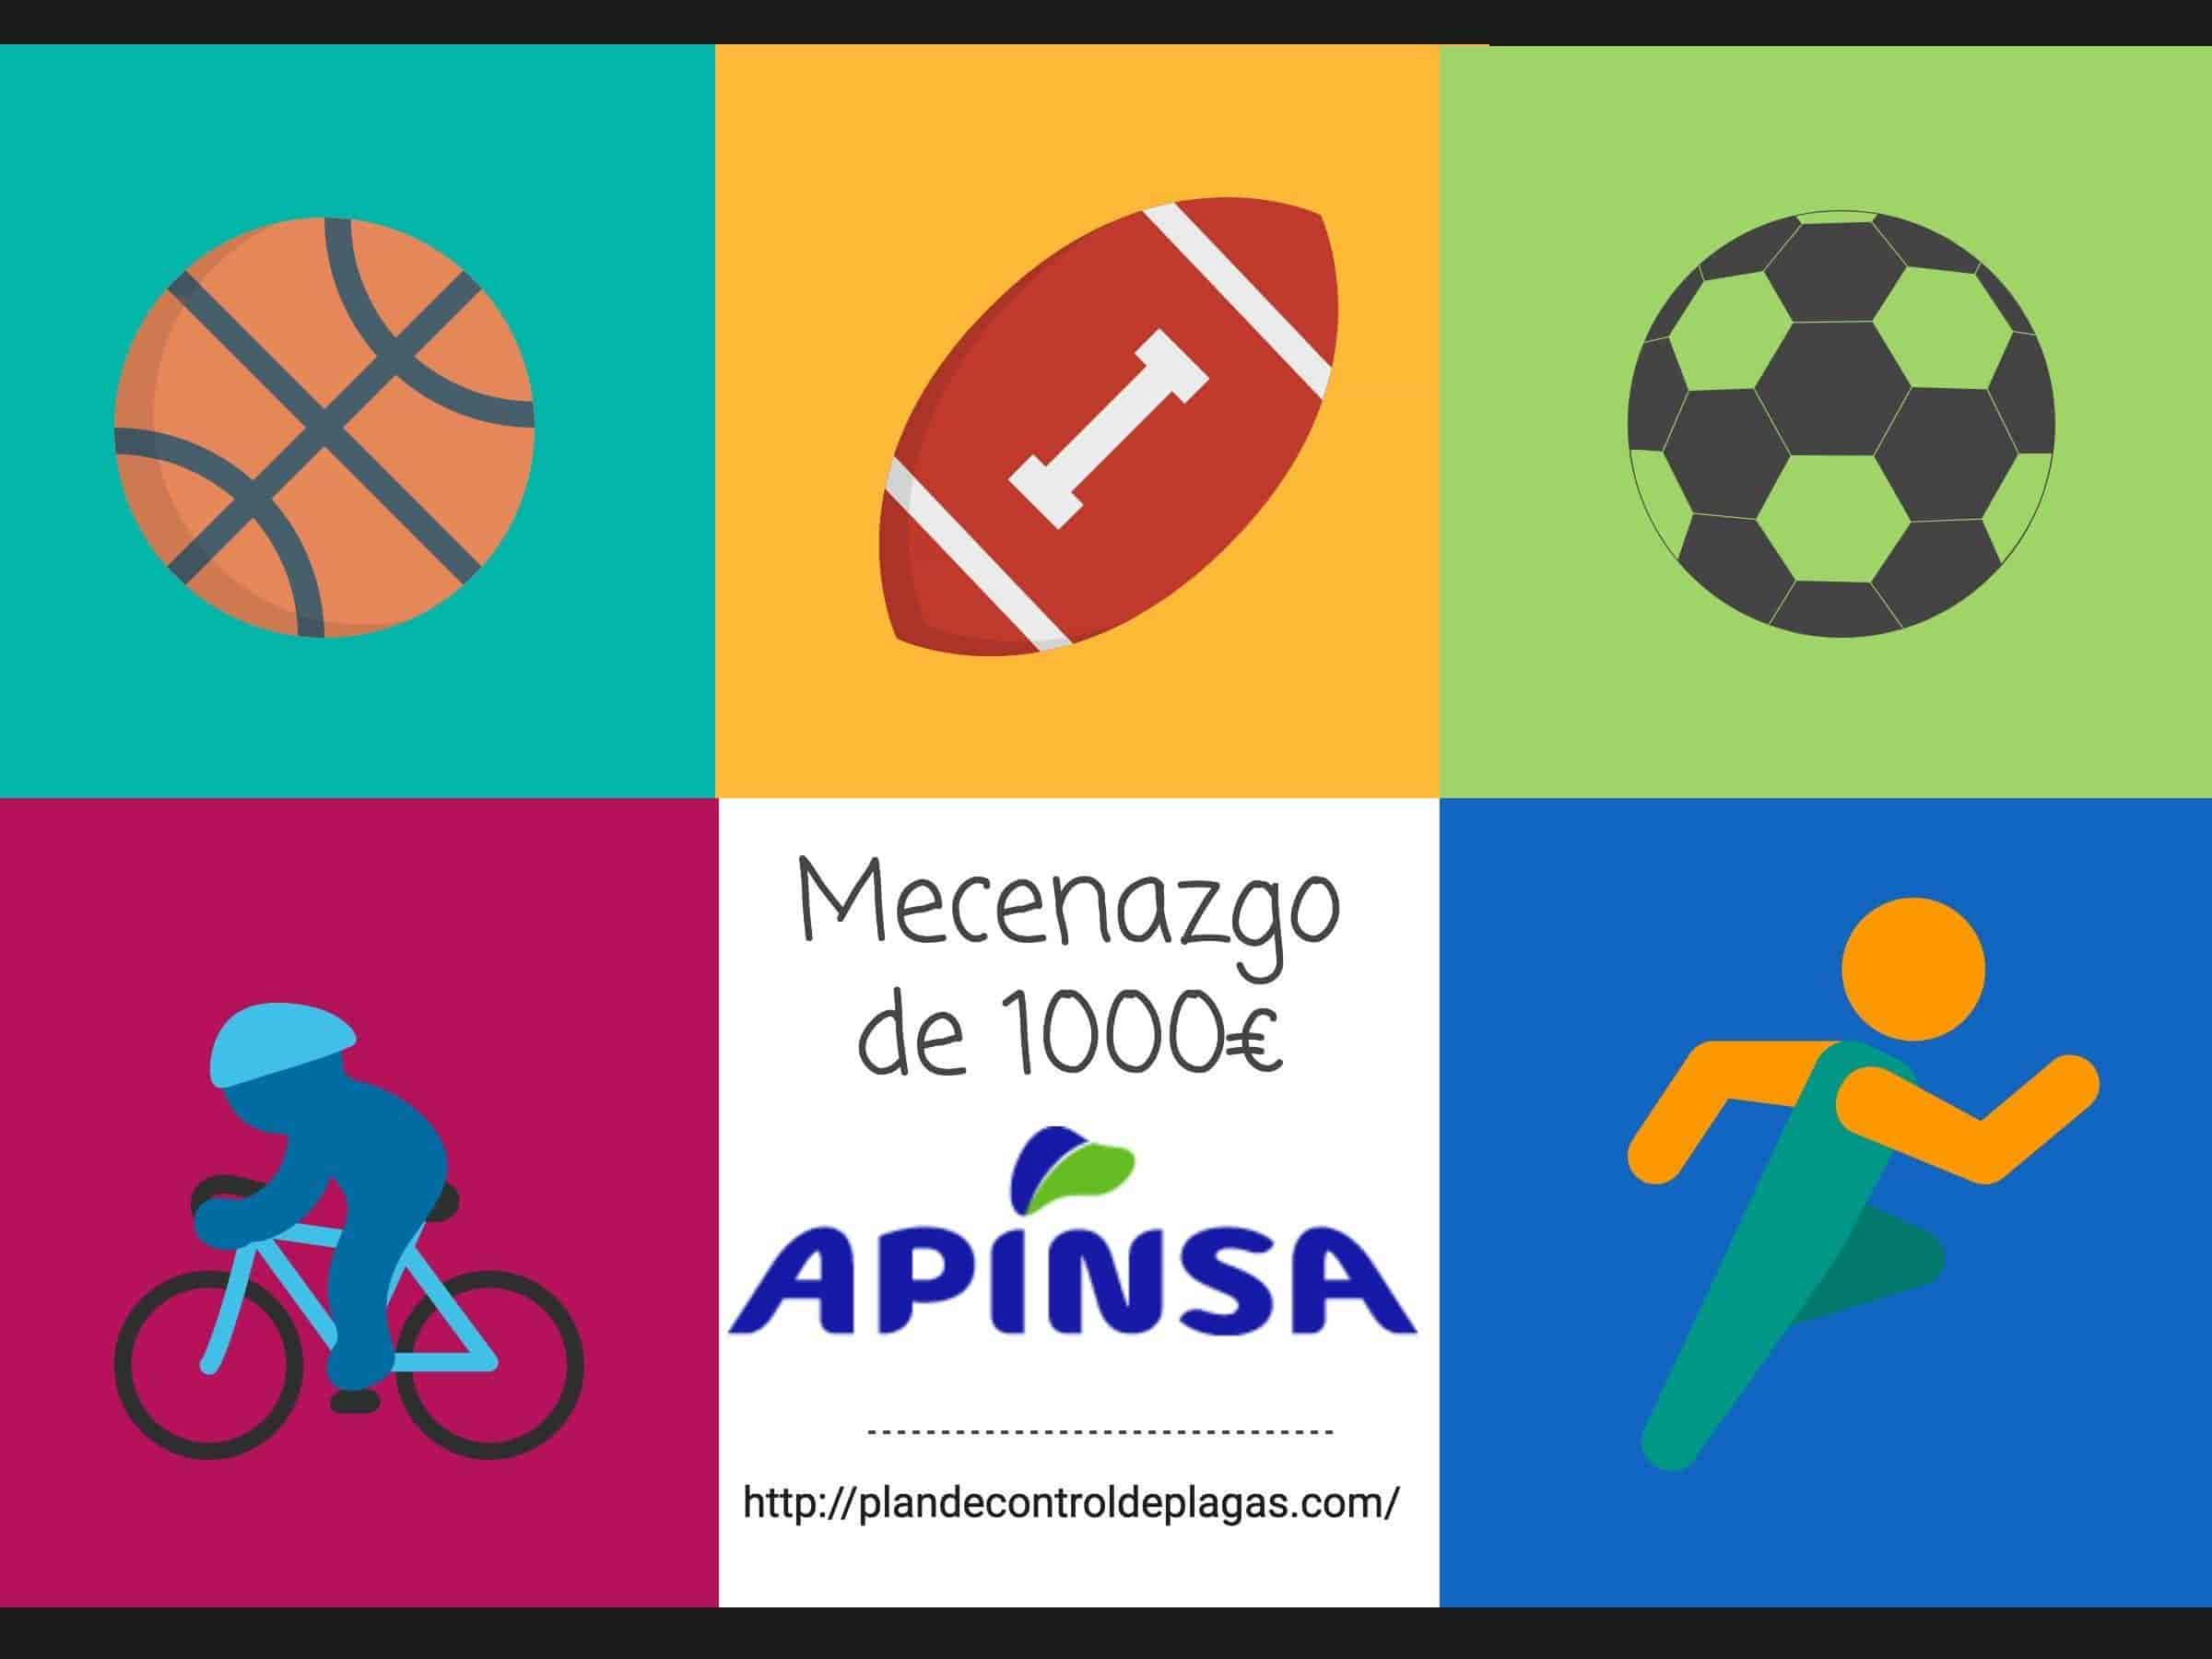 Mecenazgo para equipos de deporte base en Tenerife